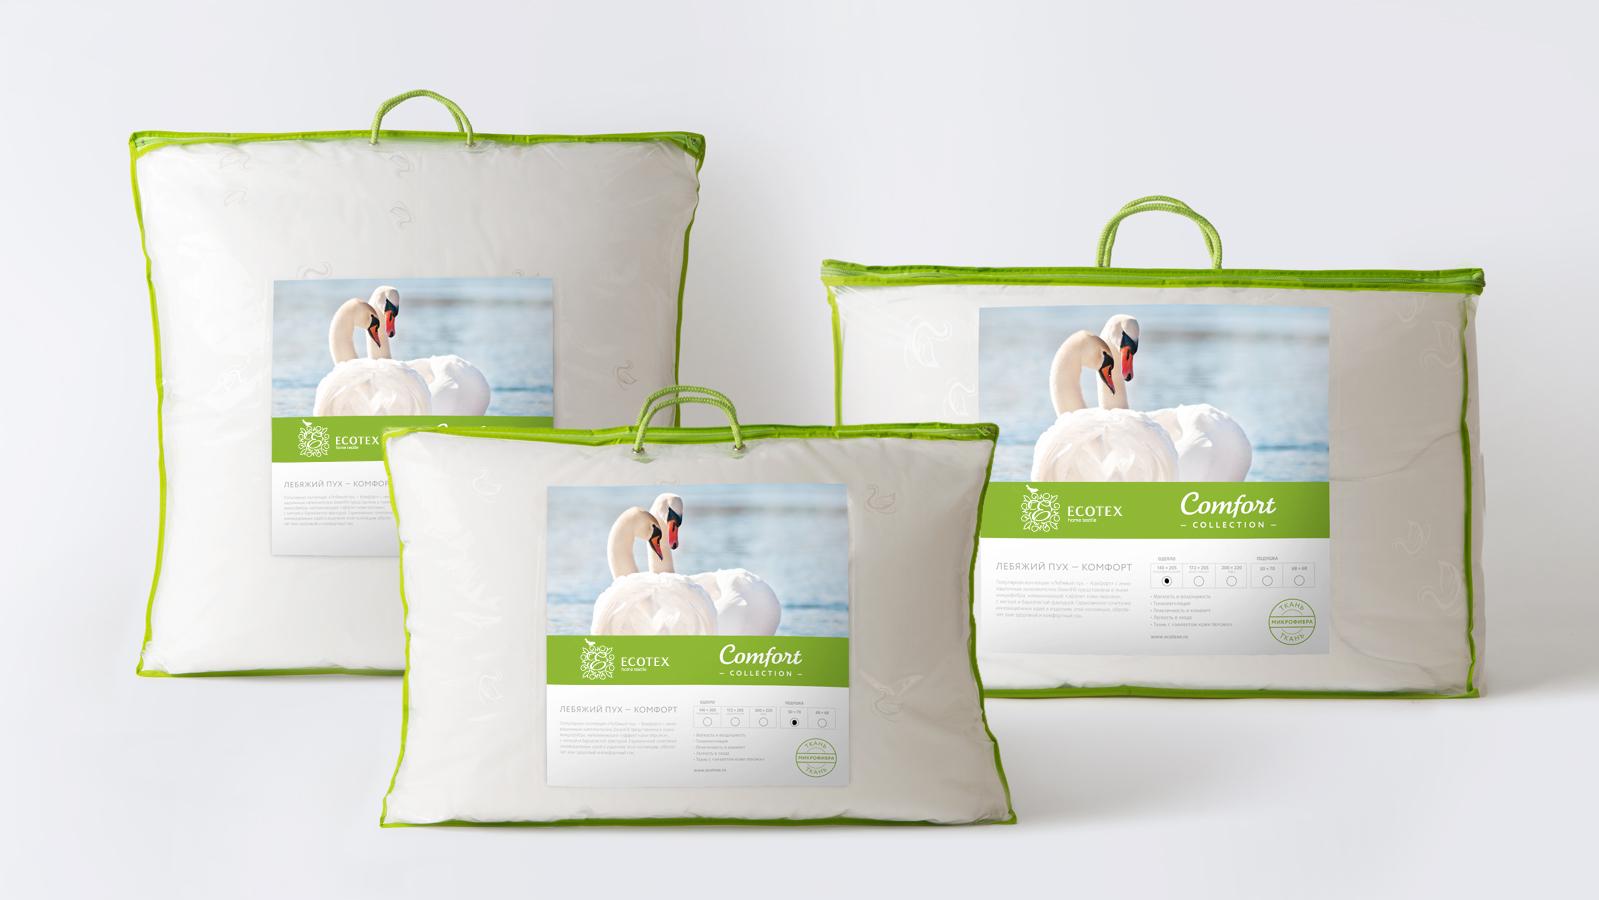 Дизайн упаковки линейки Comfort от Ecotex